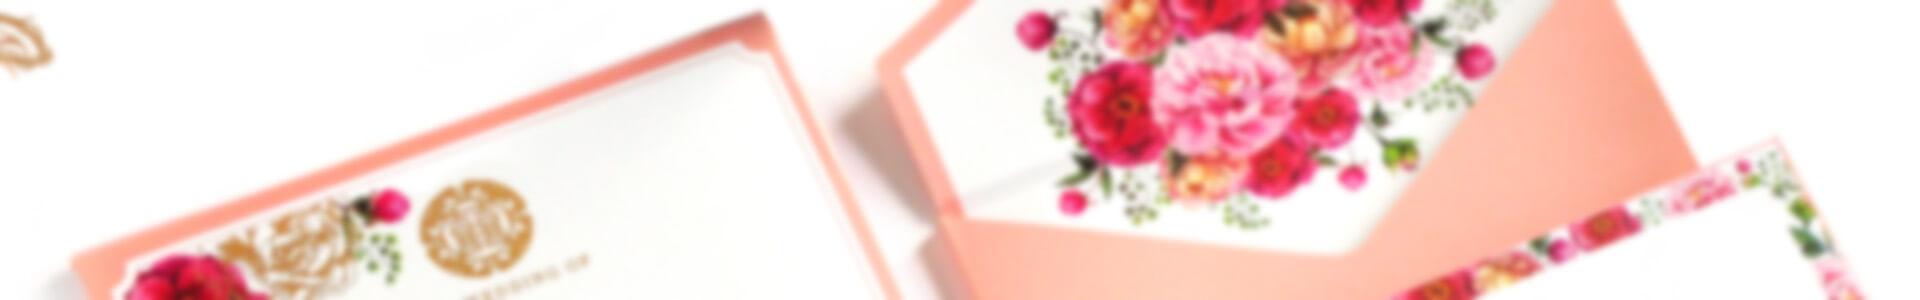 invitation mockup 2 - In thiệp cưới